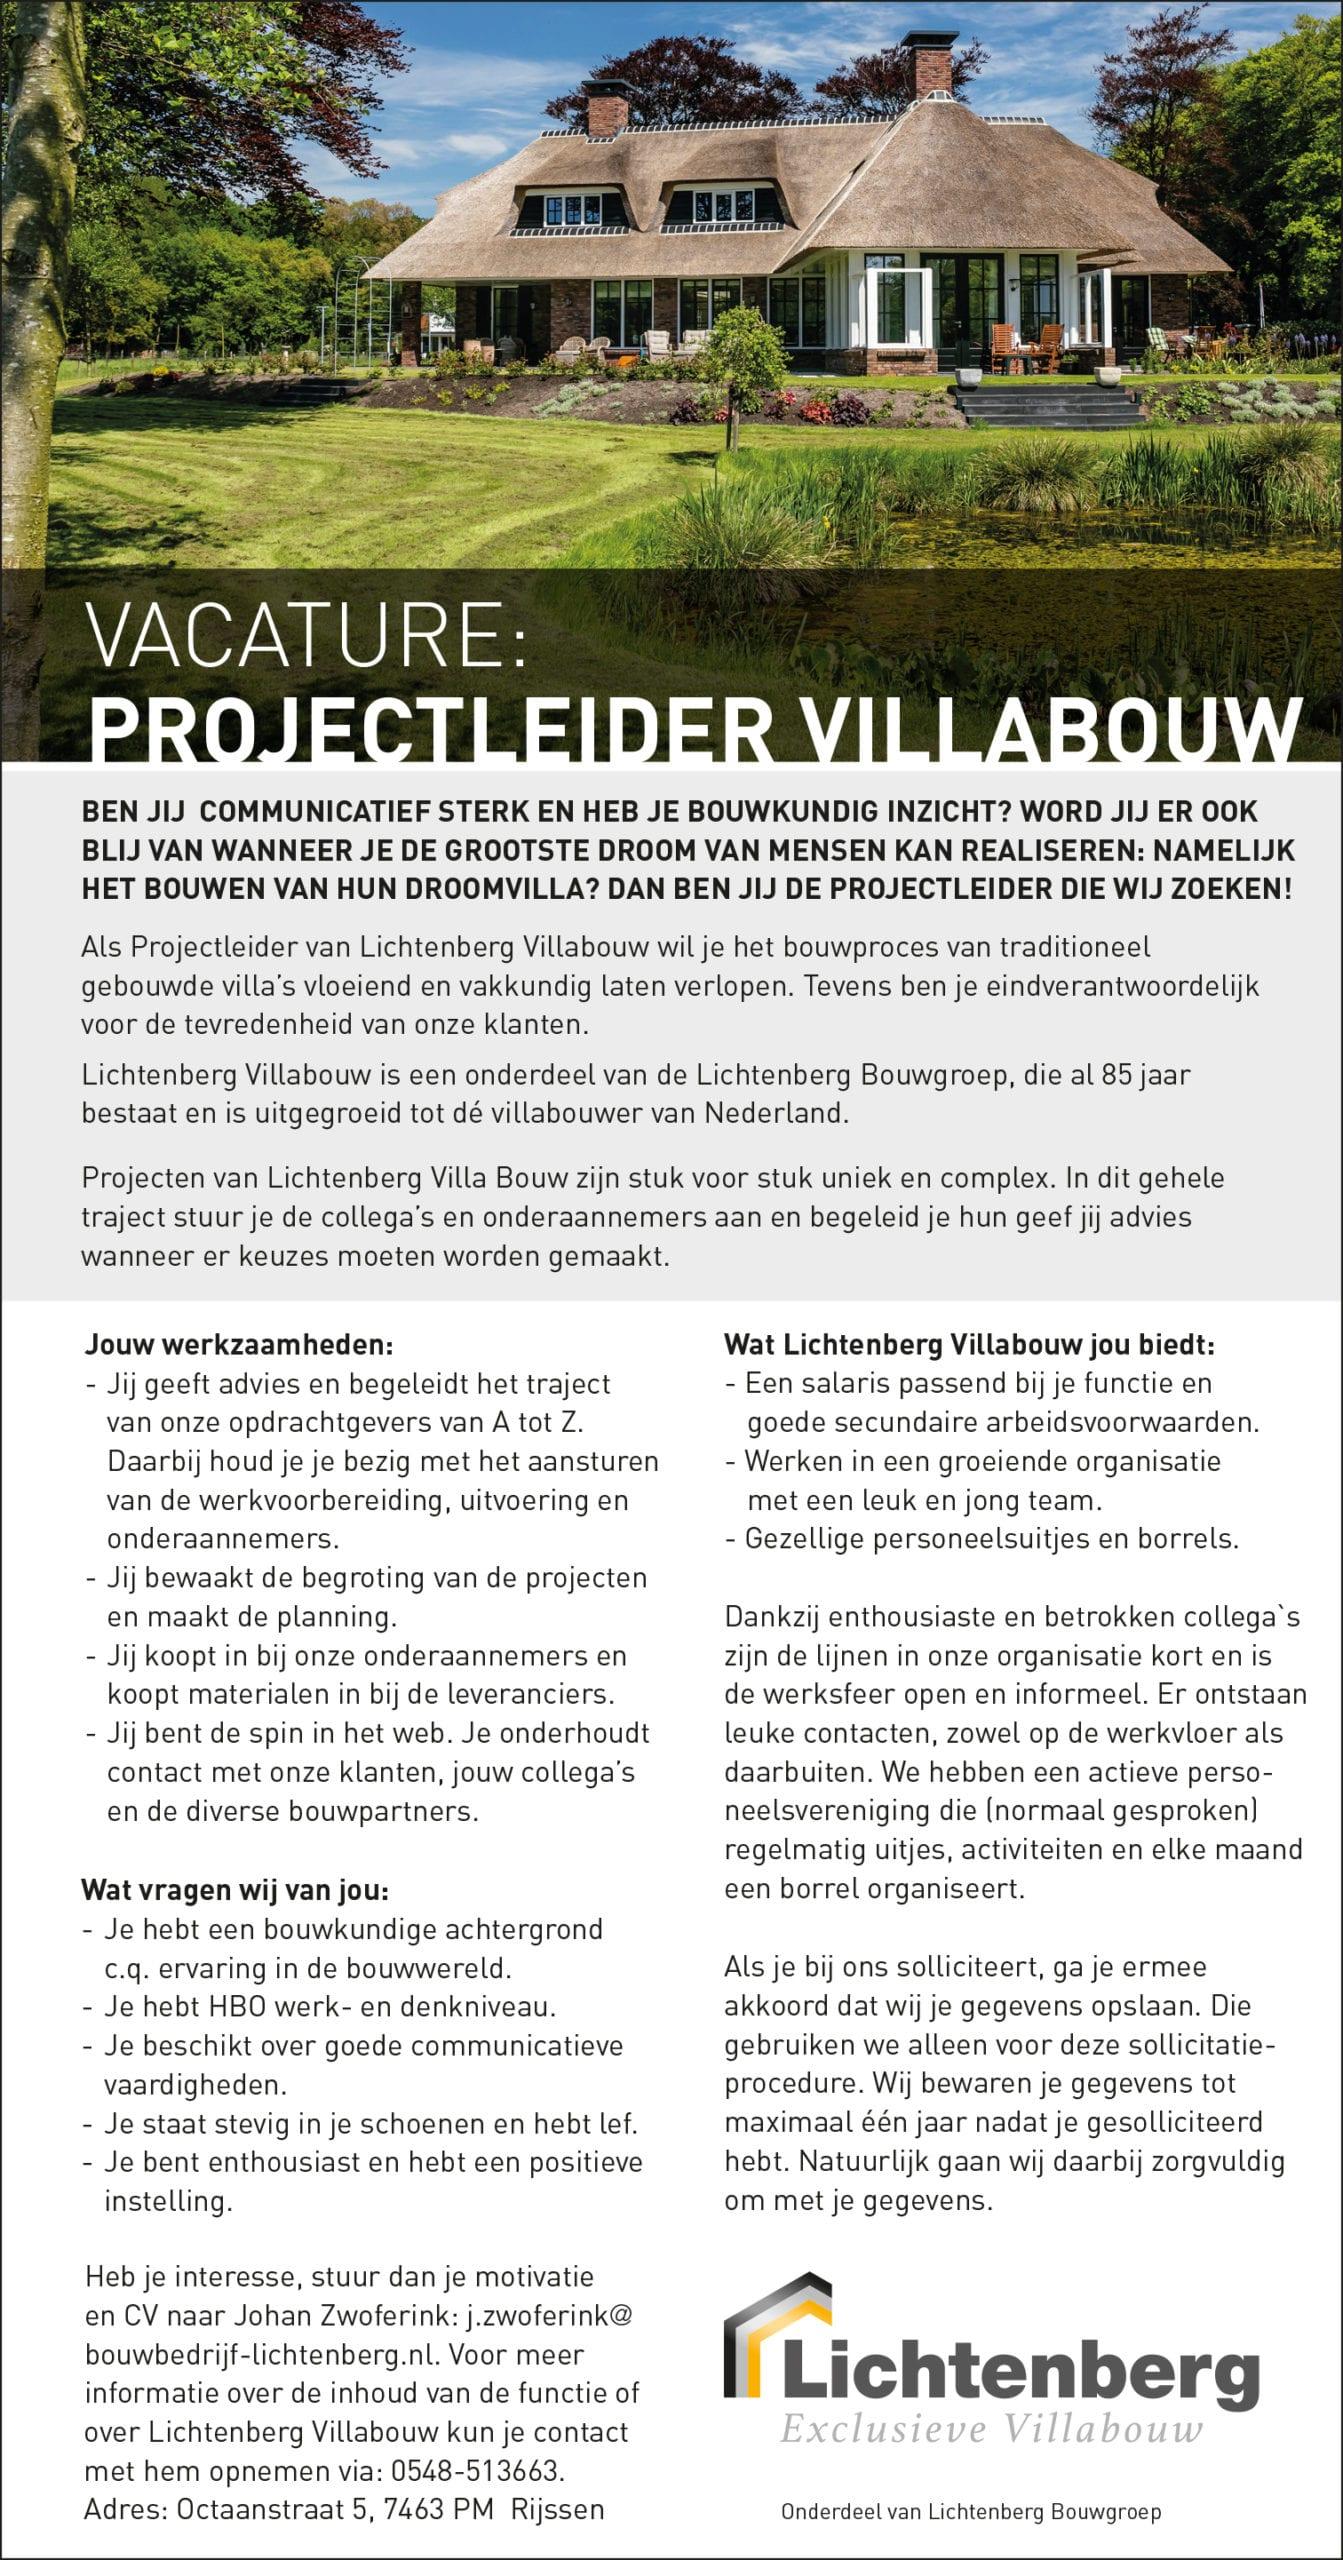 Vacature Projectleider Villabouw